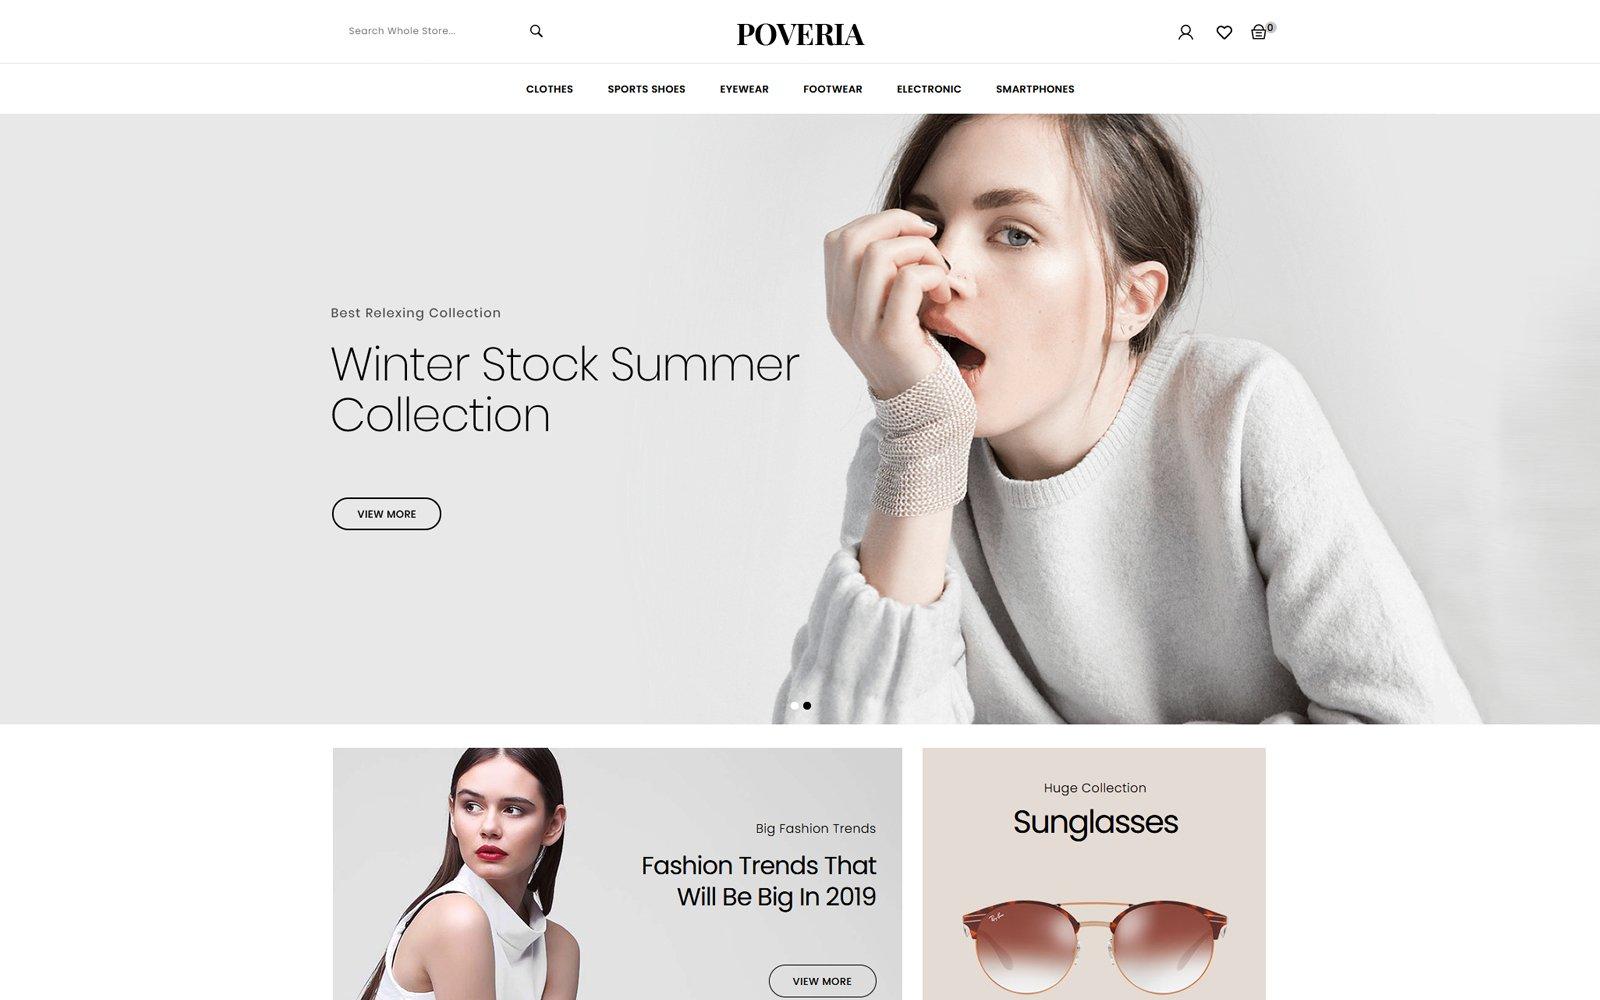 """Poveria - Fashion Accessories Stores"" - адаптивний PrestaShop шаблон №146487"